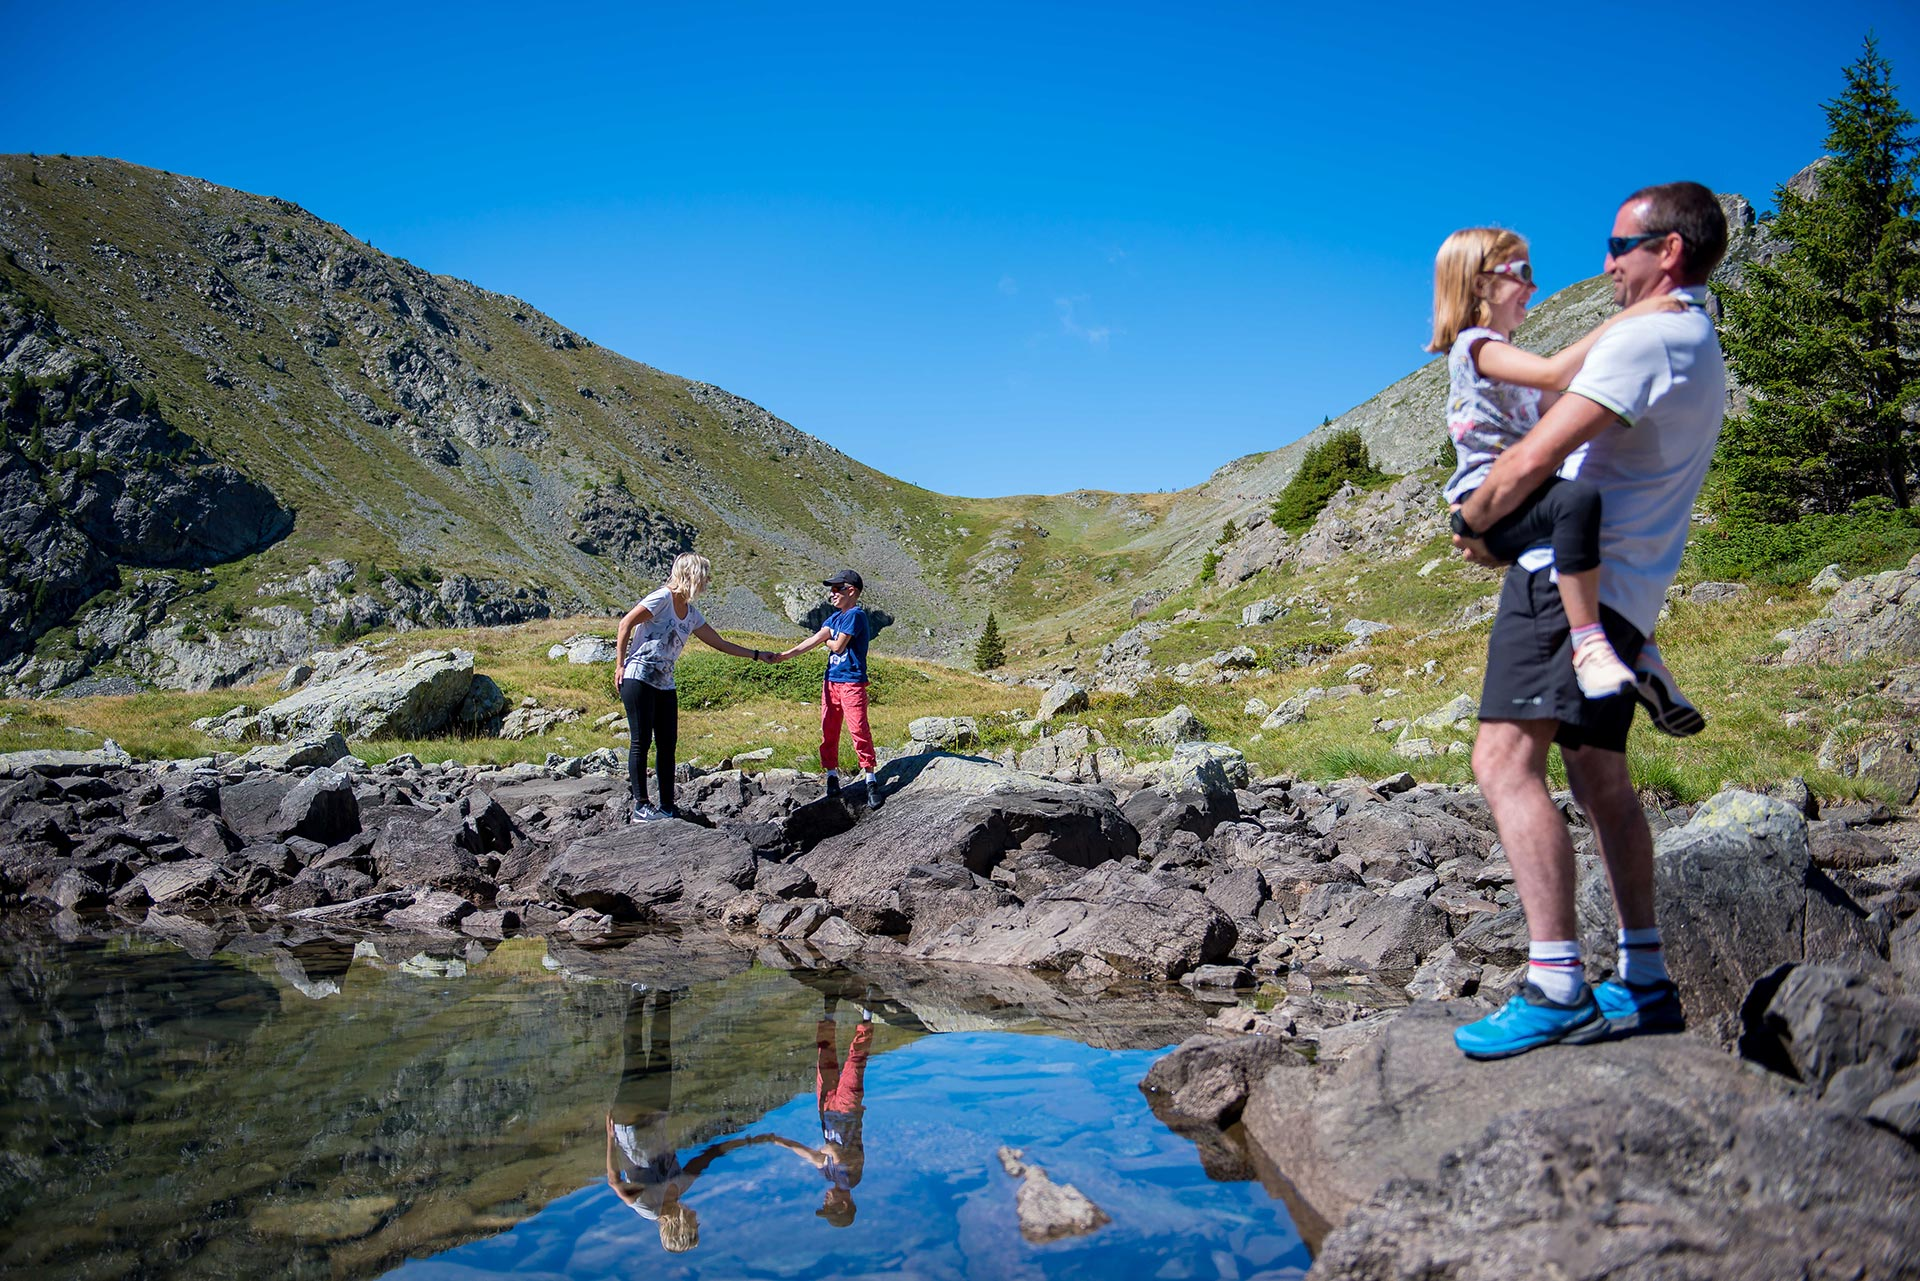 Chamrousse lac famille station montagne grenoble isère alpes france - © Images-et-reves.fr